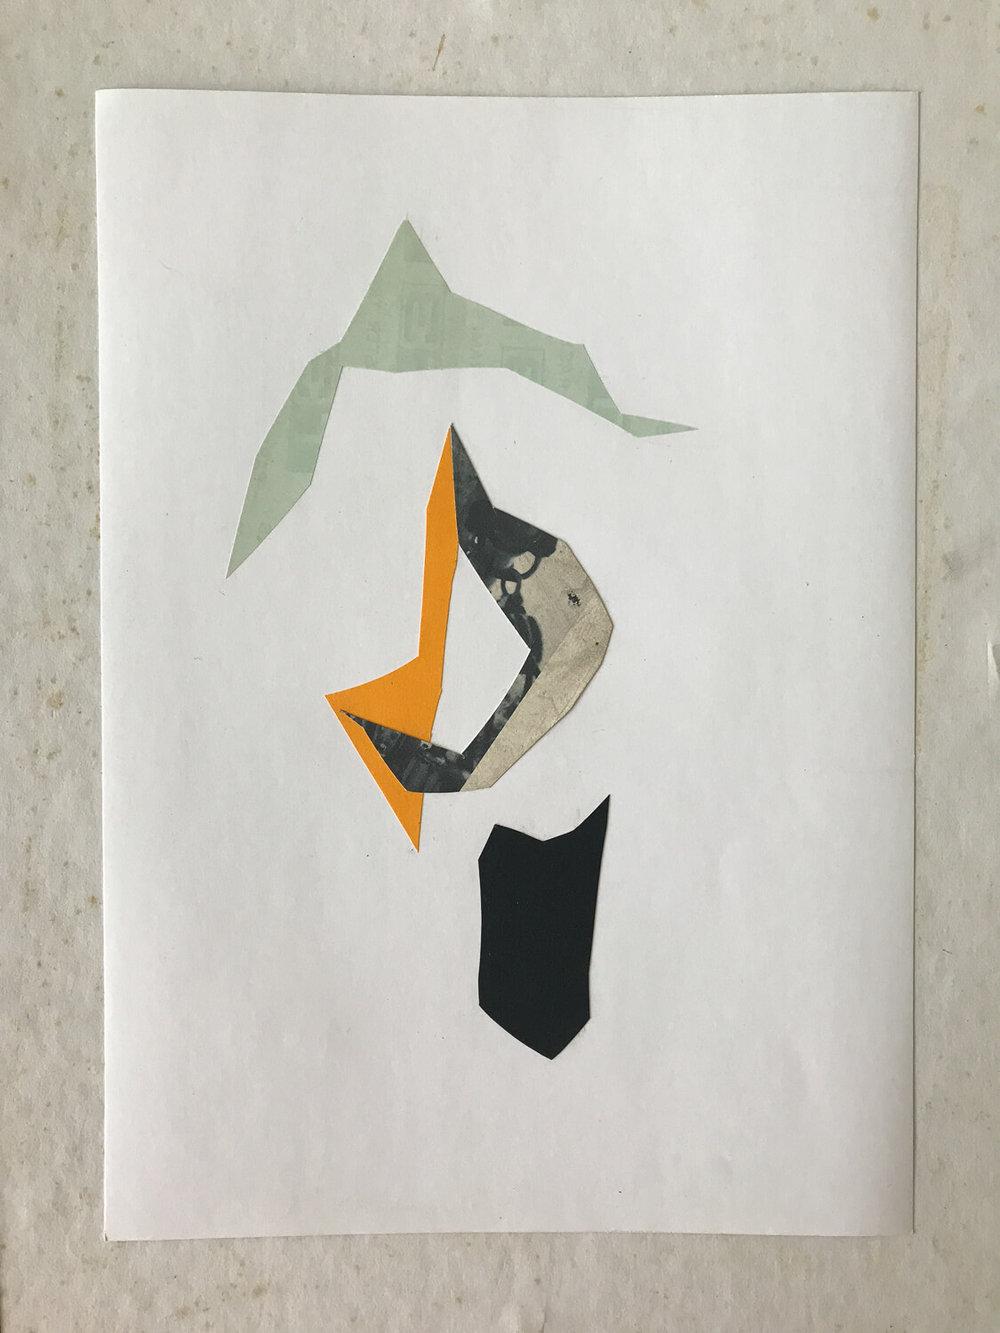 jay-paganini_20171022_untitled_01_00x00cm_paper-collage_web.jpg